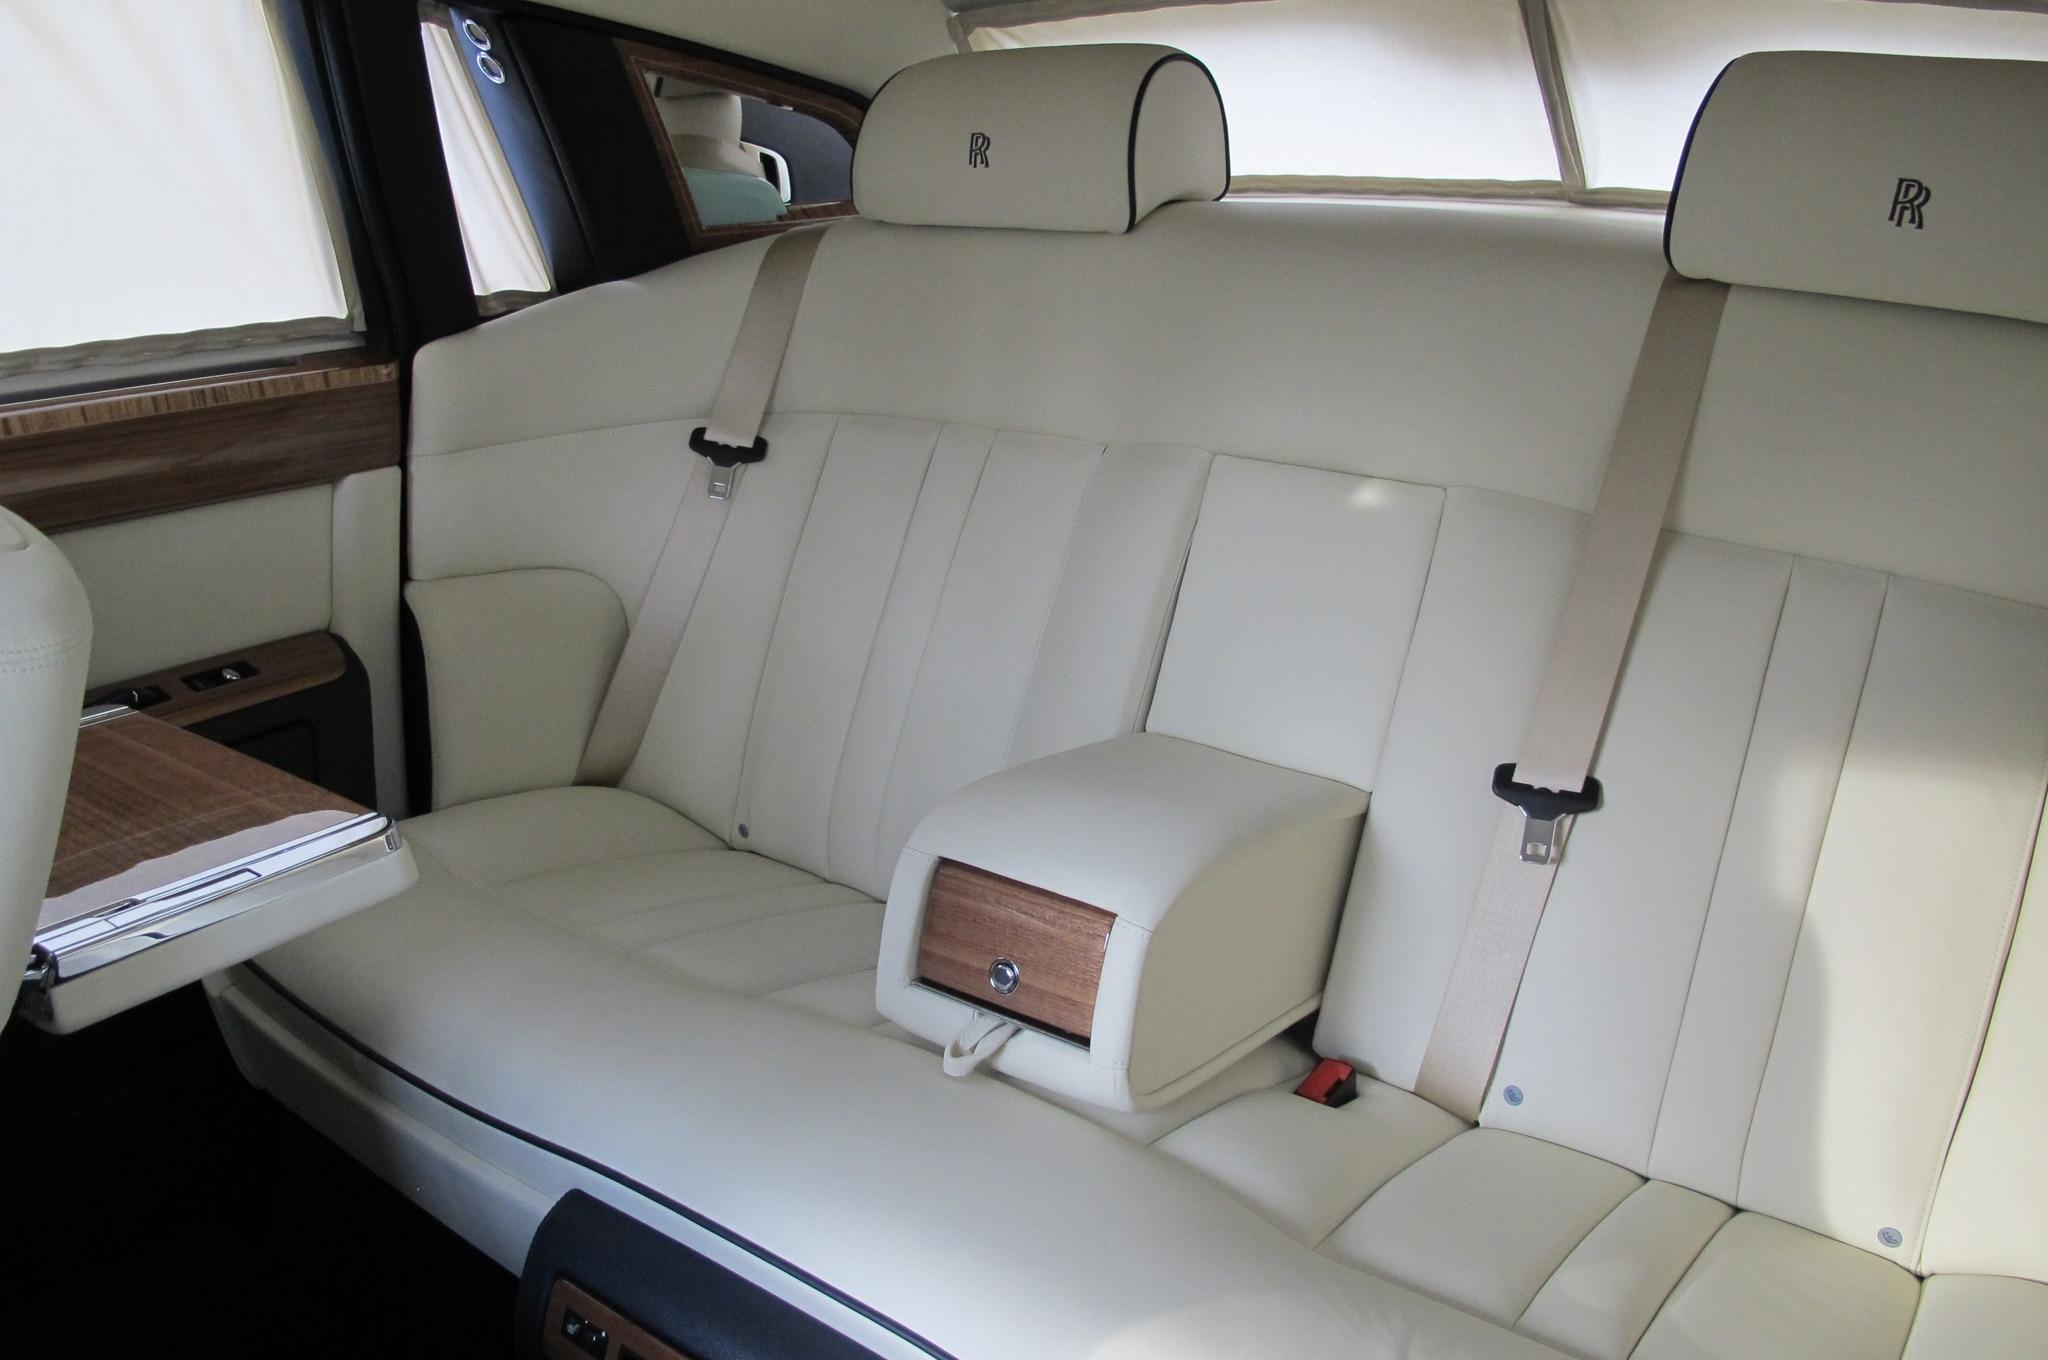 2014 rolls royce phantom interior. more impressive 2014 rolls royce phantom interior